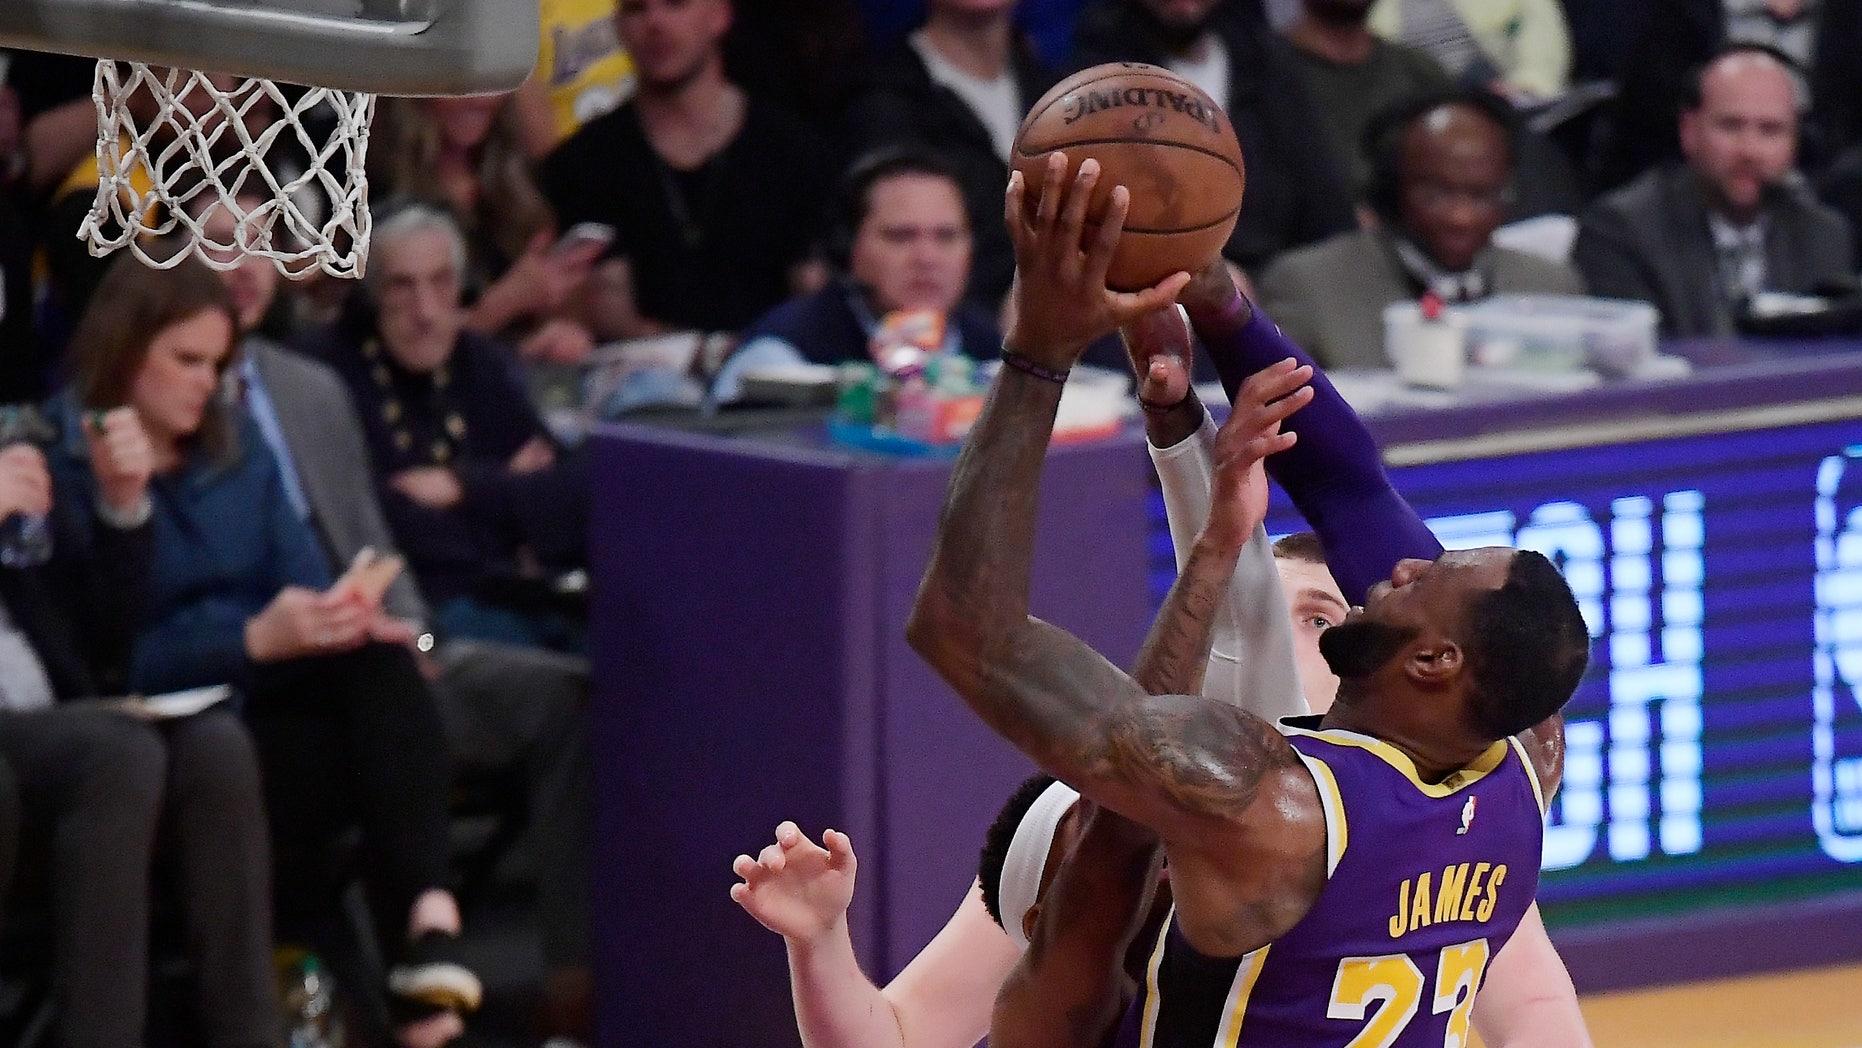 aca11b389548 Los Angeles Lakers forward LeBron James